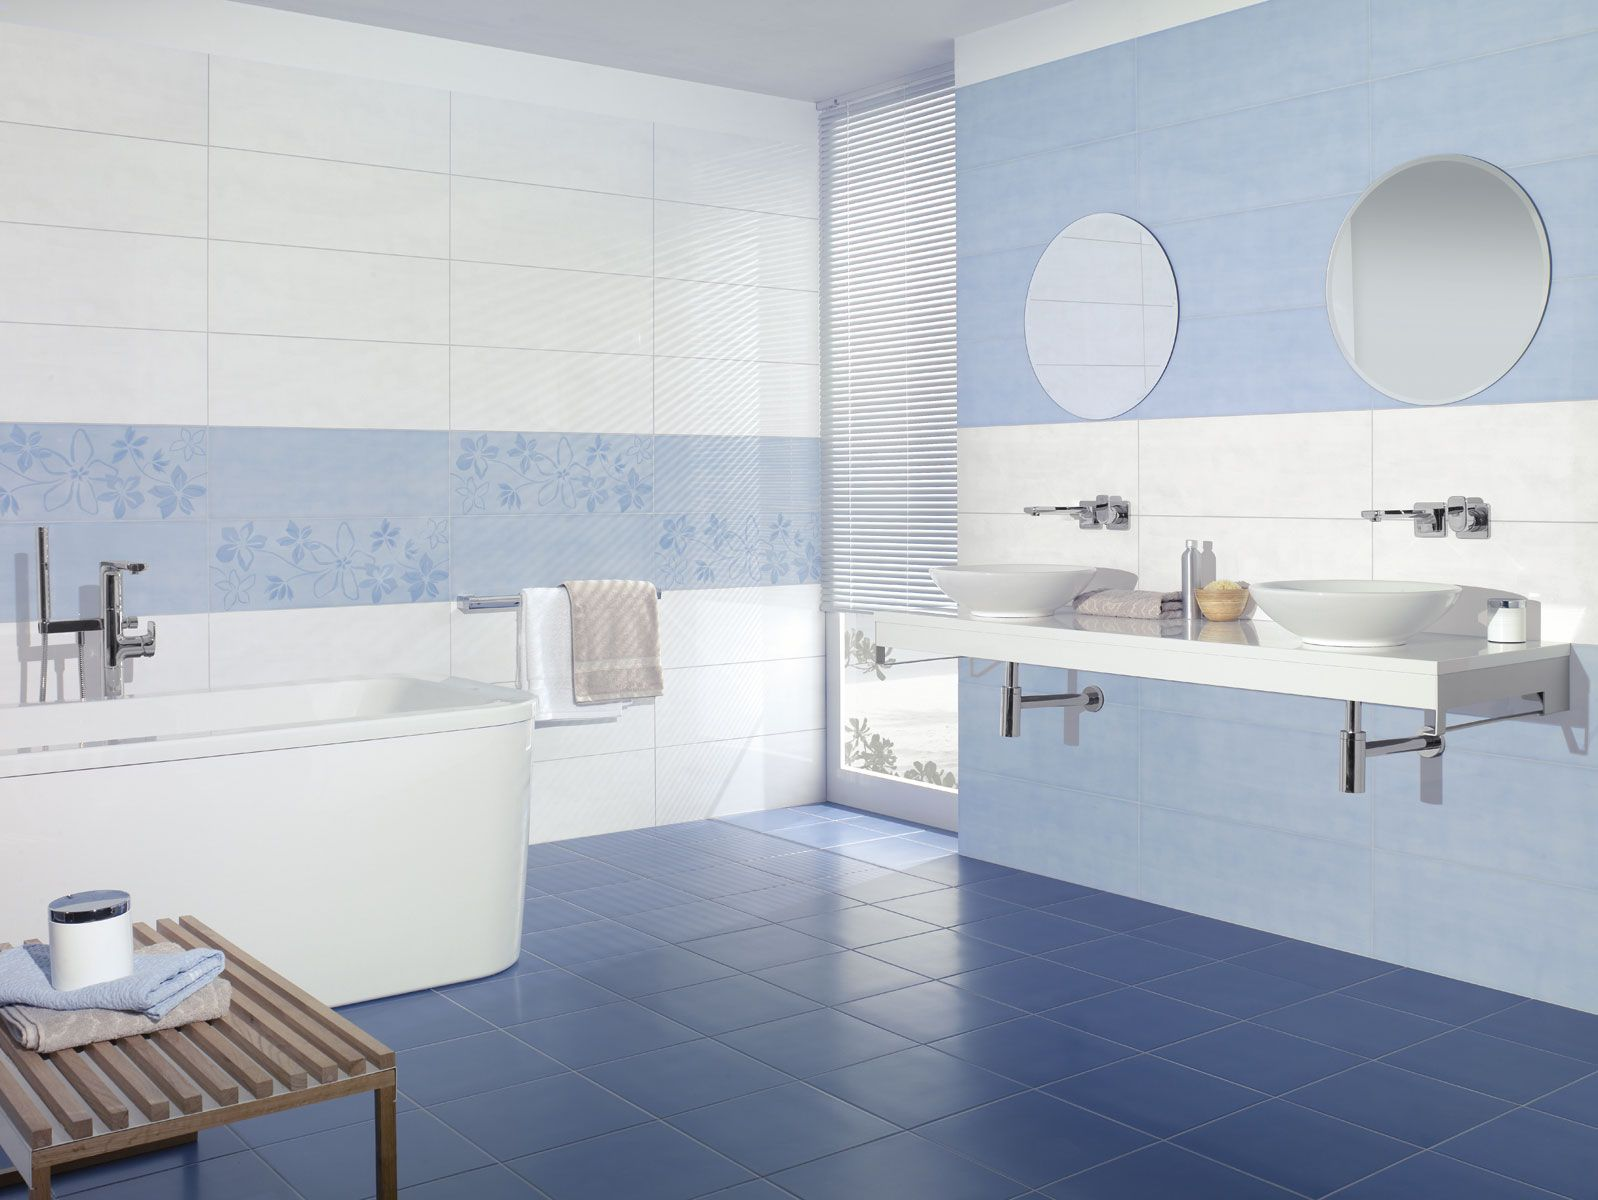 carrelage mural salle de bains faence summer love espace aubade